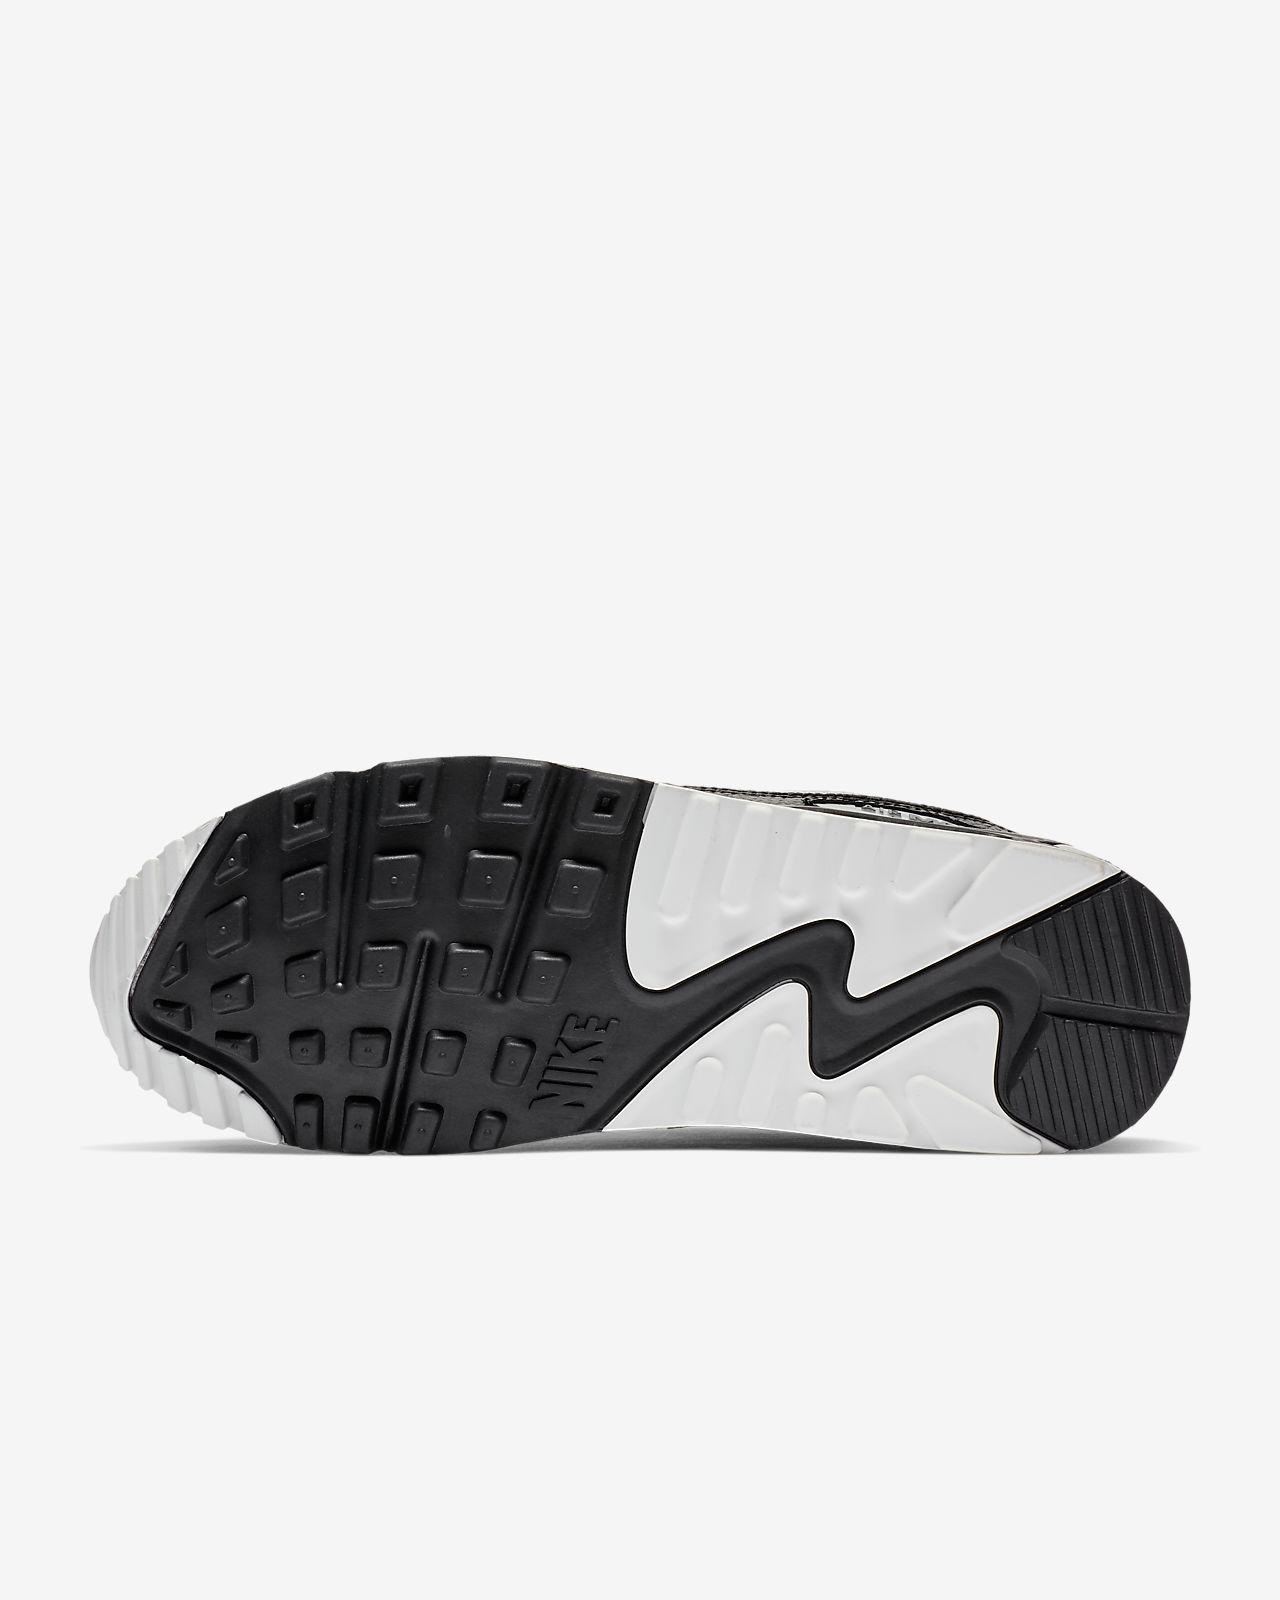 8c18c8085c0 Calzado para mujer Nike Air Max 90. Nike.com MX